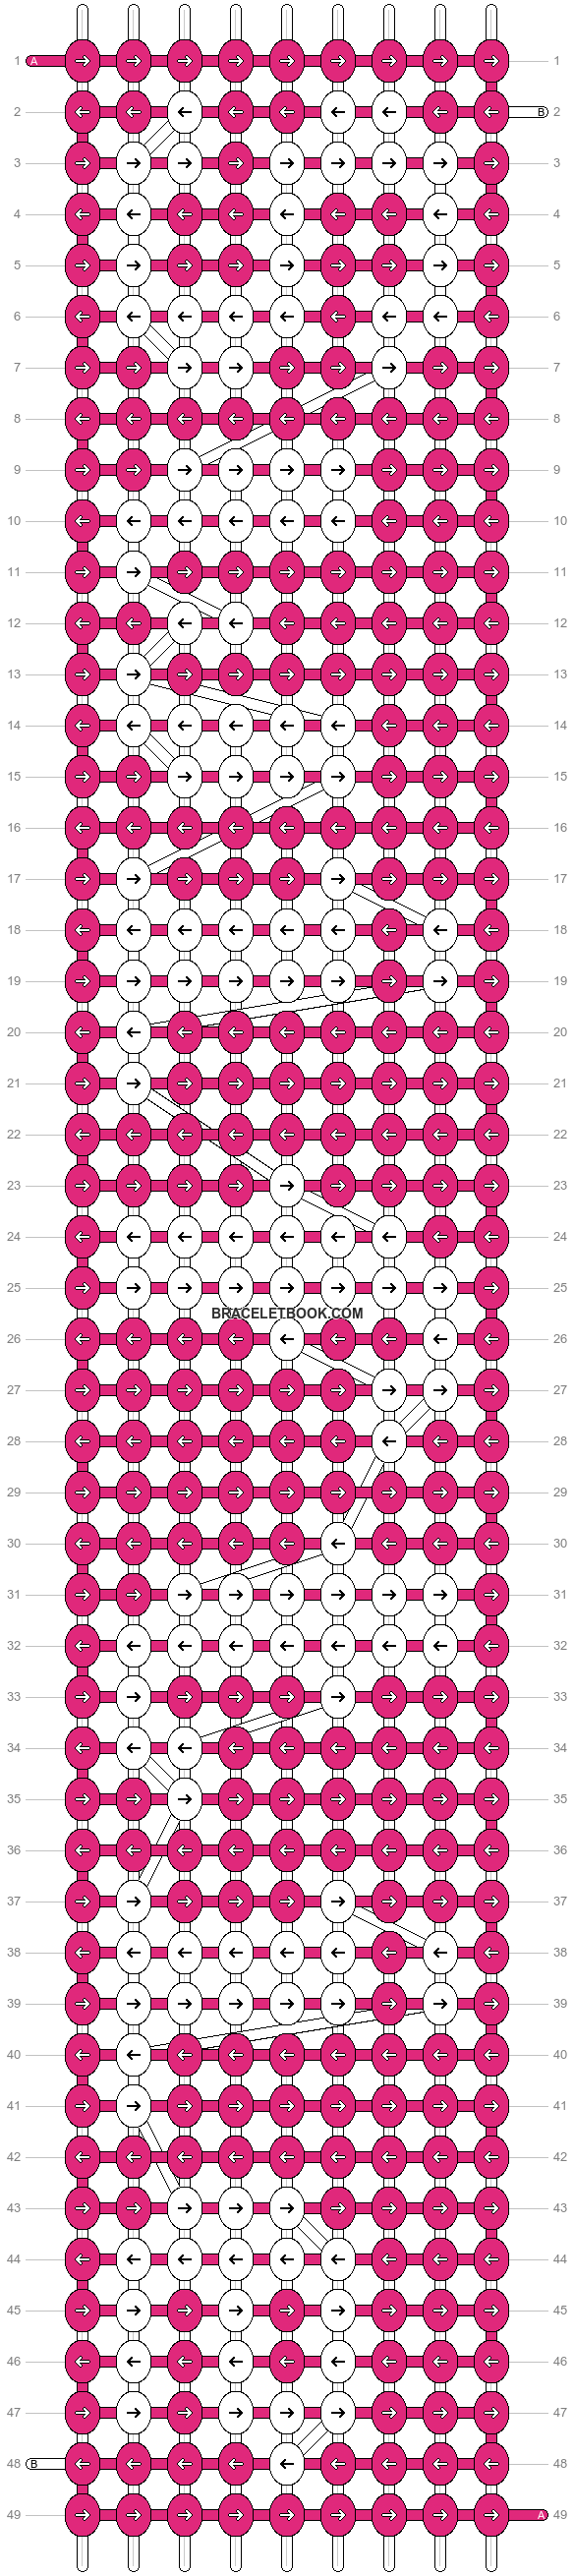 Alpha pattern #5817 pattern